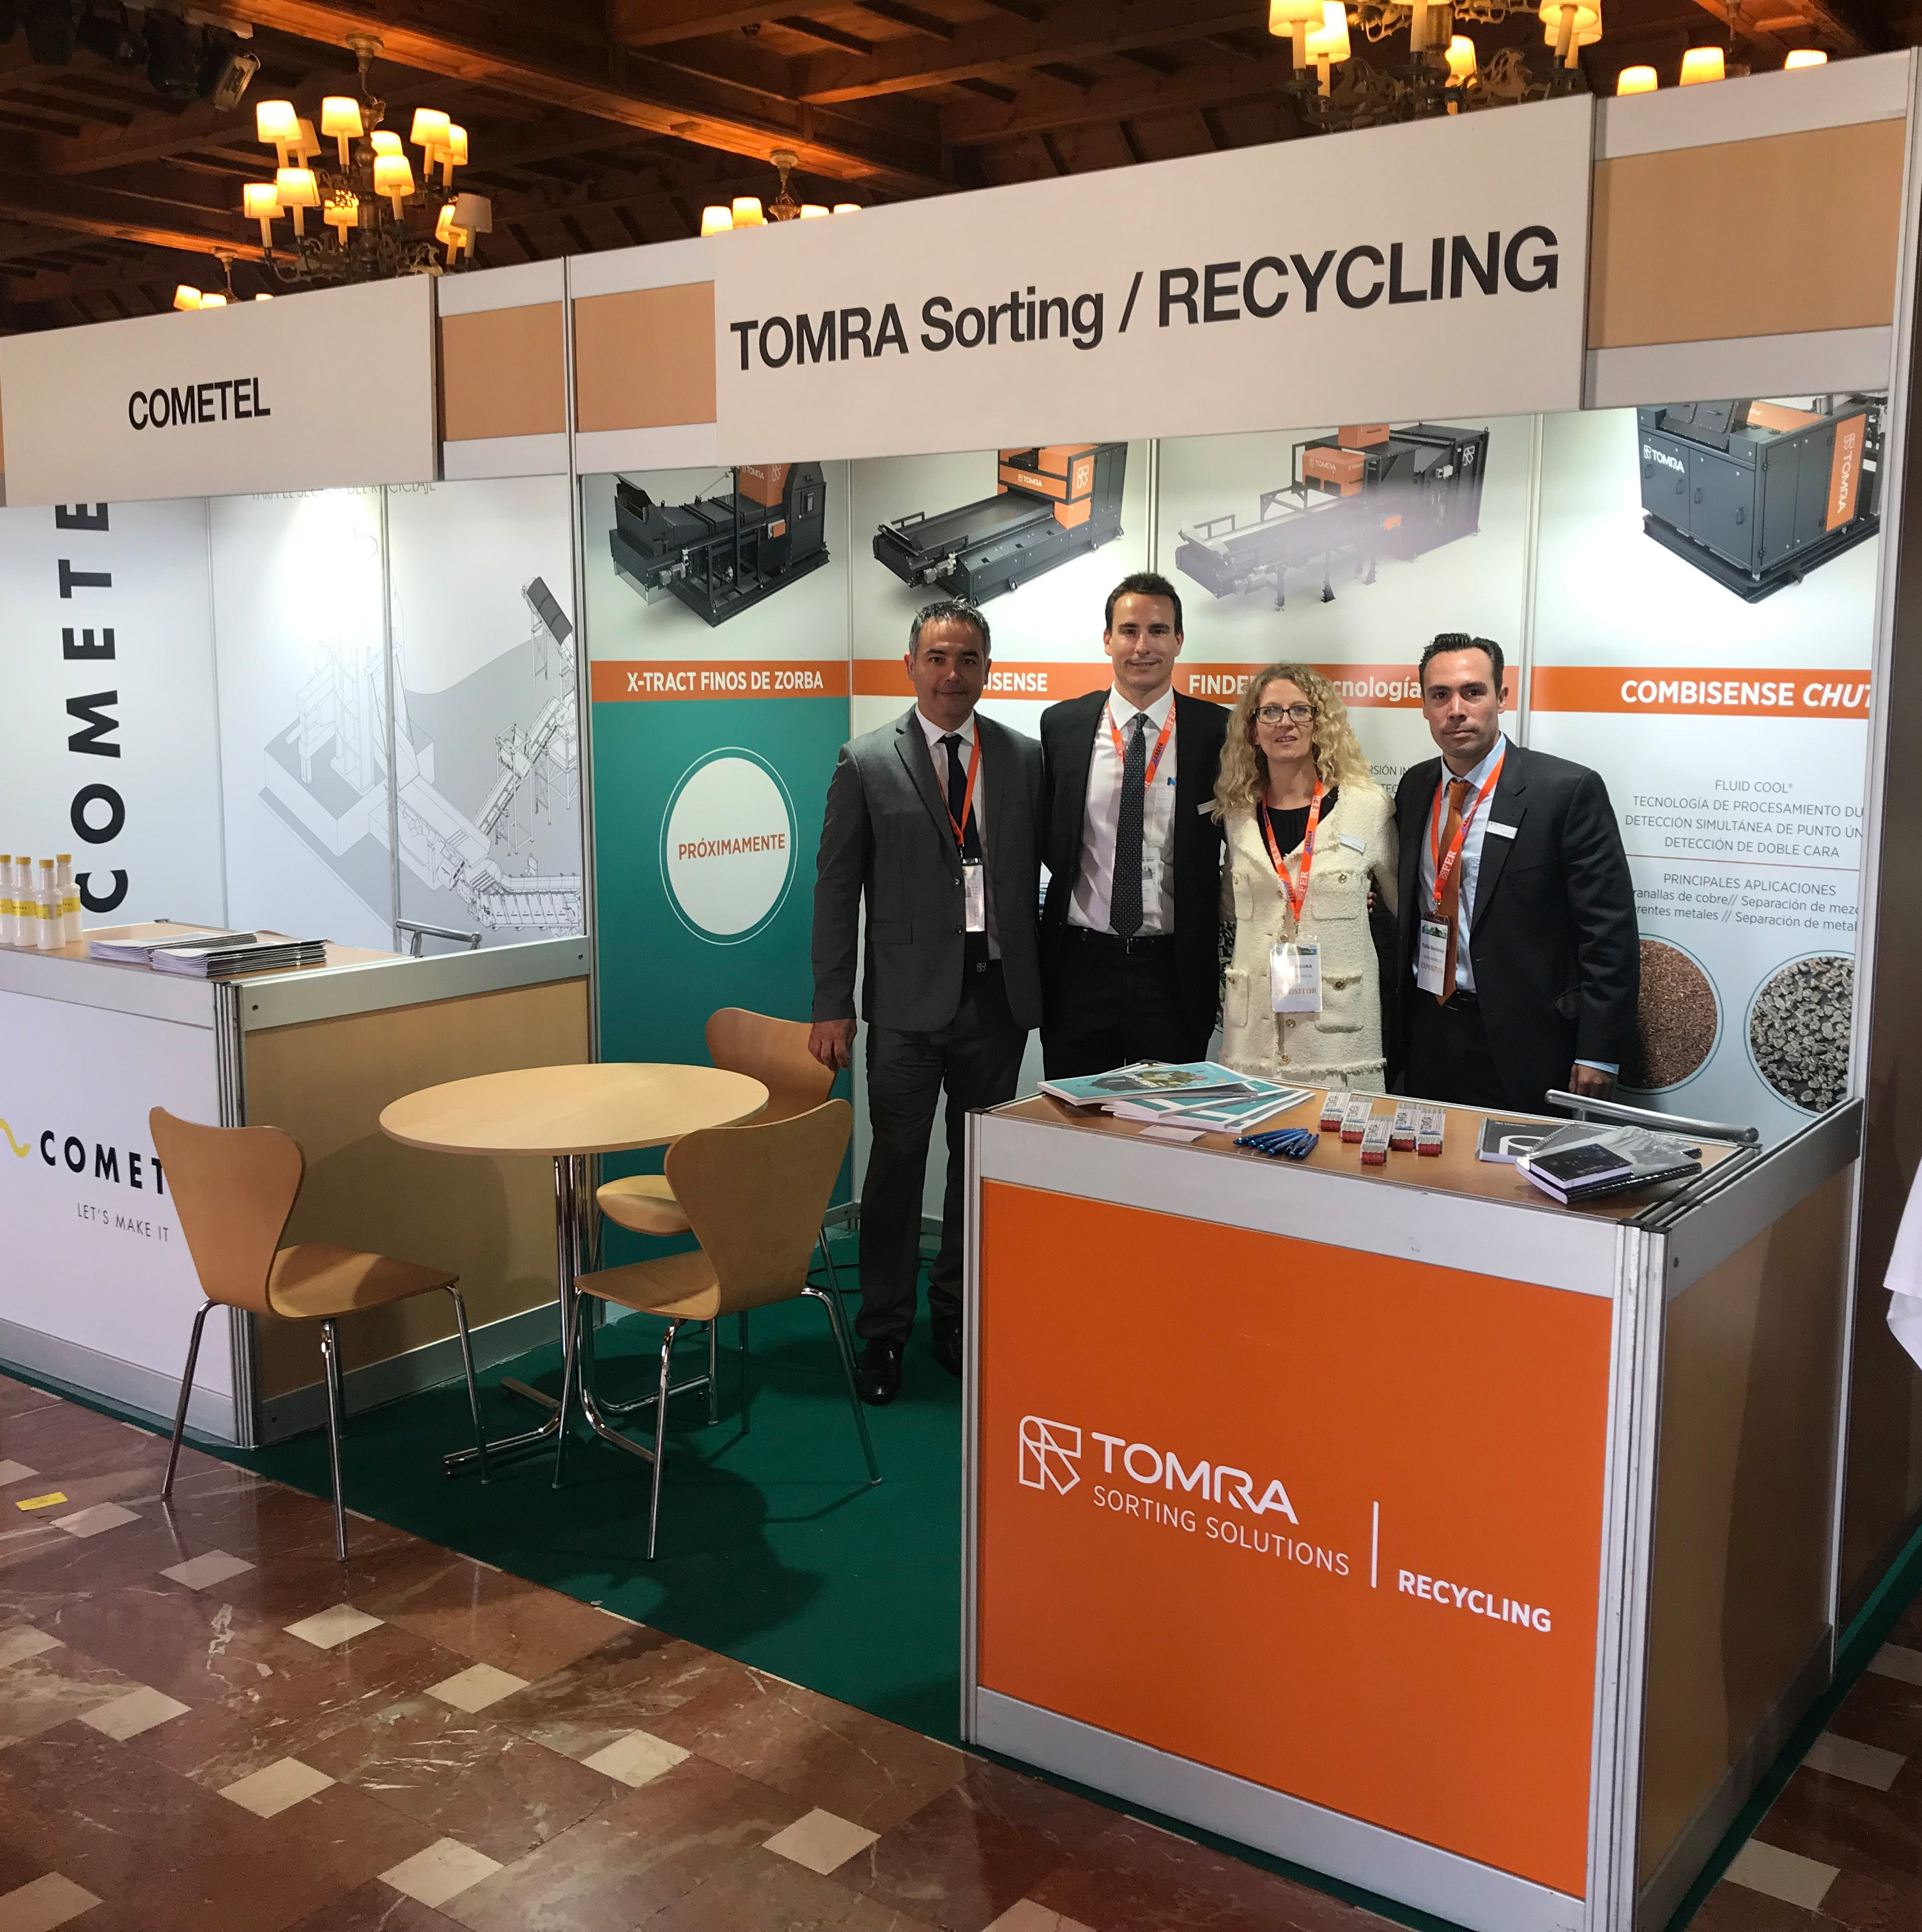 Equipo TOMRA Sorting Recycling_Congreso de la FER 2019